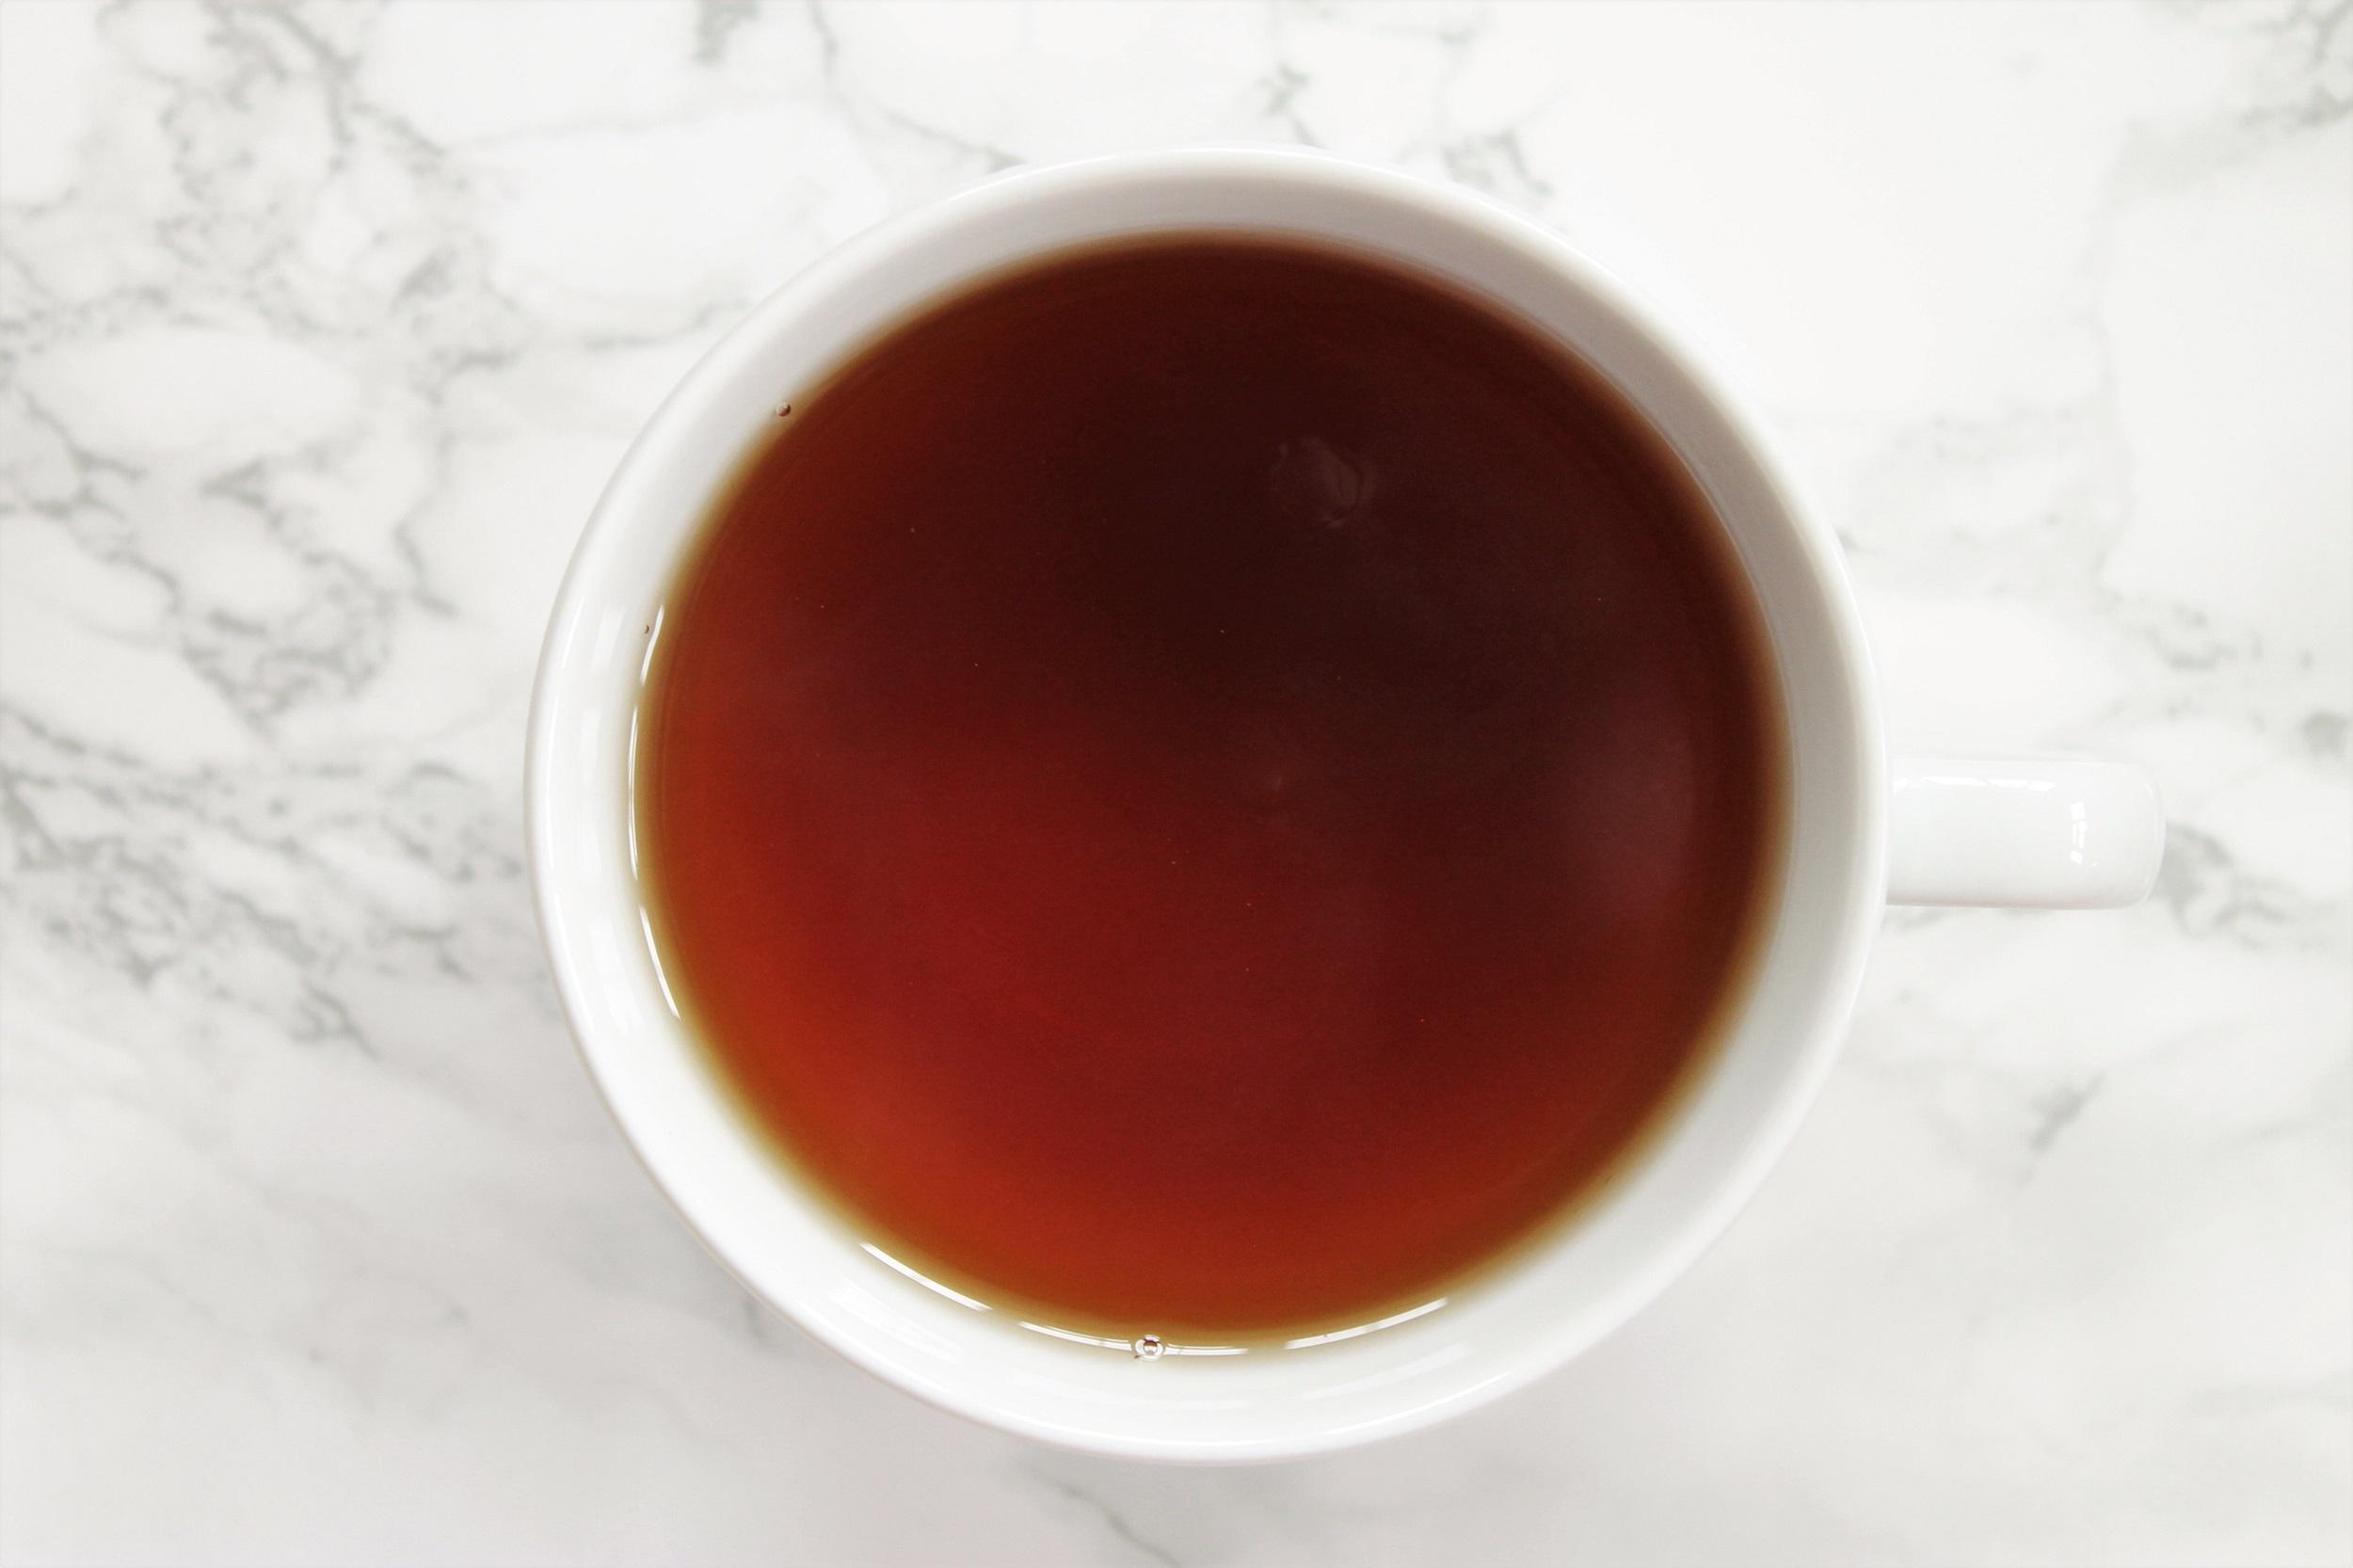 black tea in white teacup